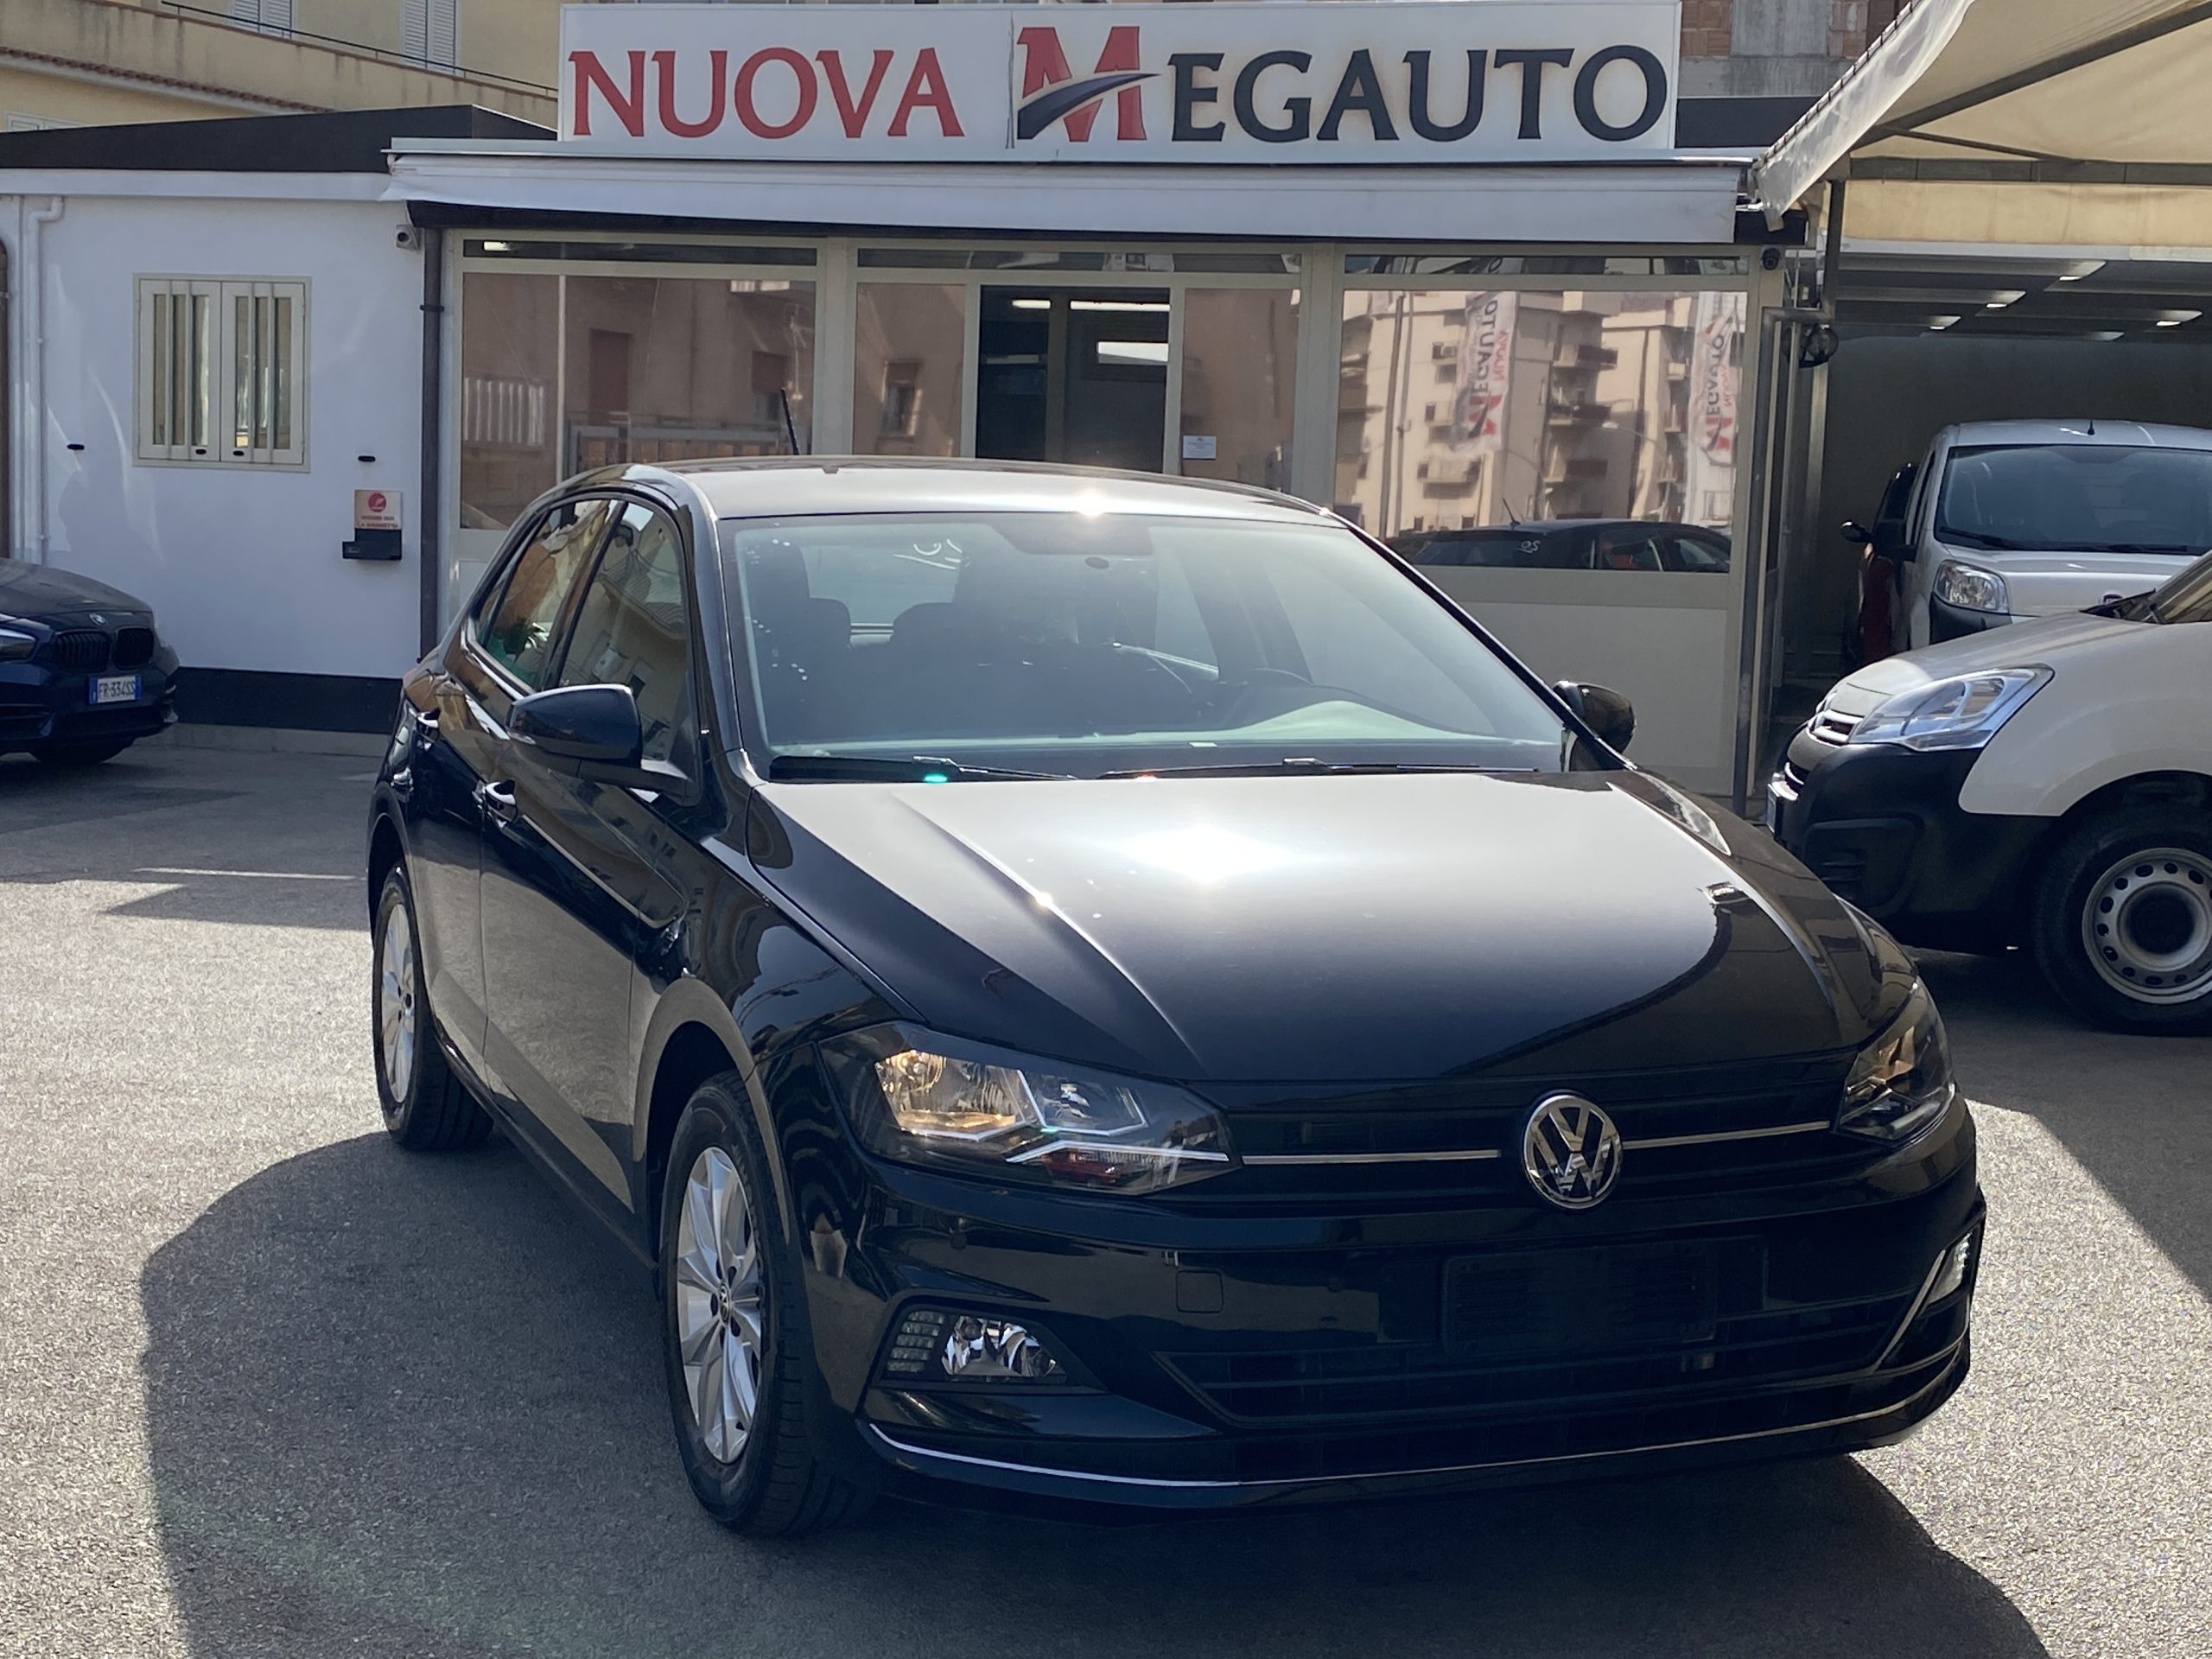 Volkswagen Polo 1.6 TDI 95 CV 5p. Highline BlueMotion Tech.